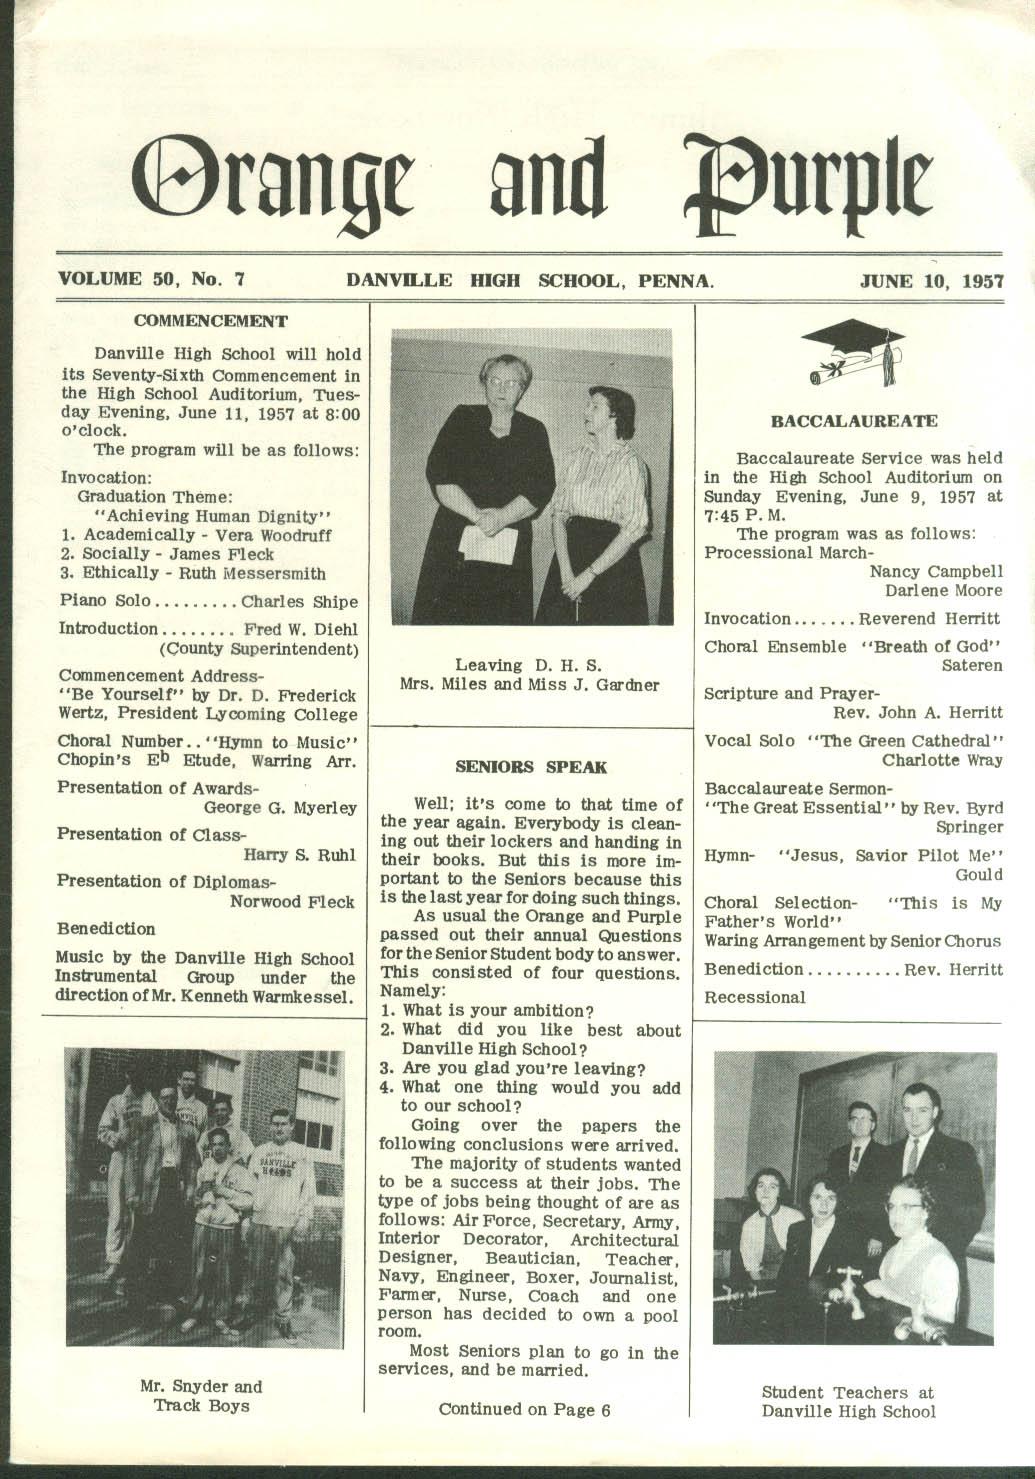 Danville High School ORANGE & PURPLE news 6/10 1957 Danville PA